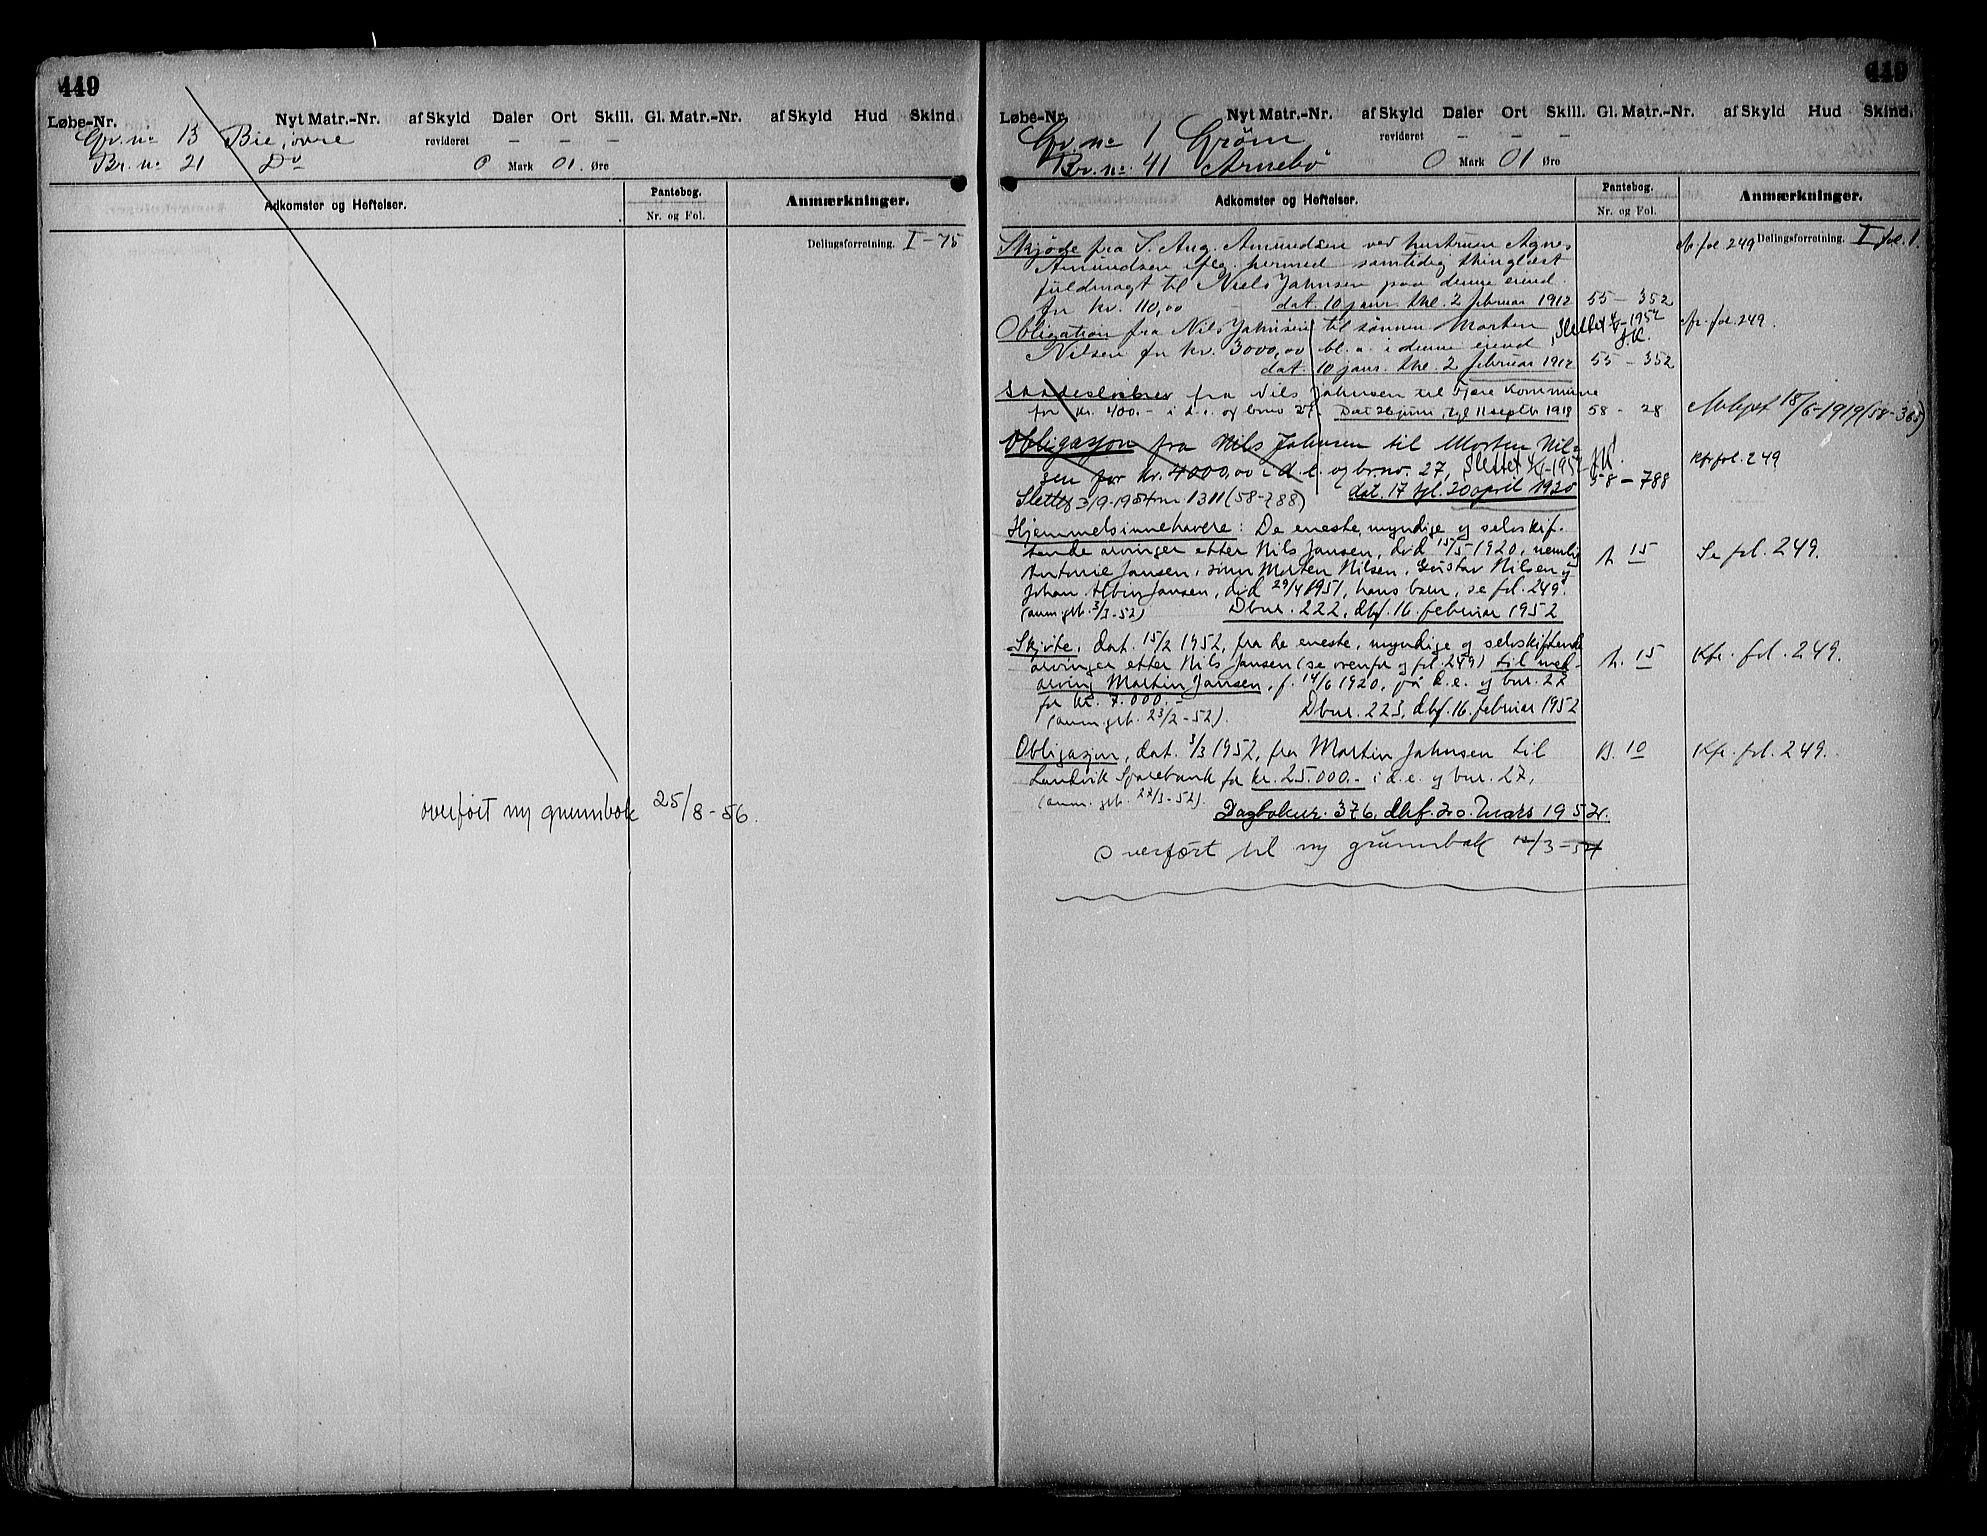 SAK, Vestre Nedenes/Sand sorenskriveri, G/Ga/L0018: Panteregister nr. 13b, 1872-1956, s. 449